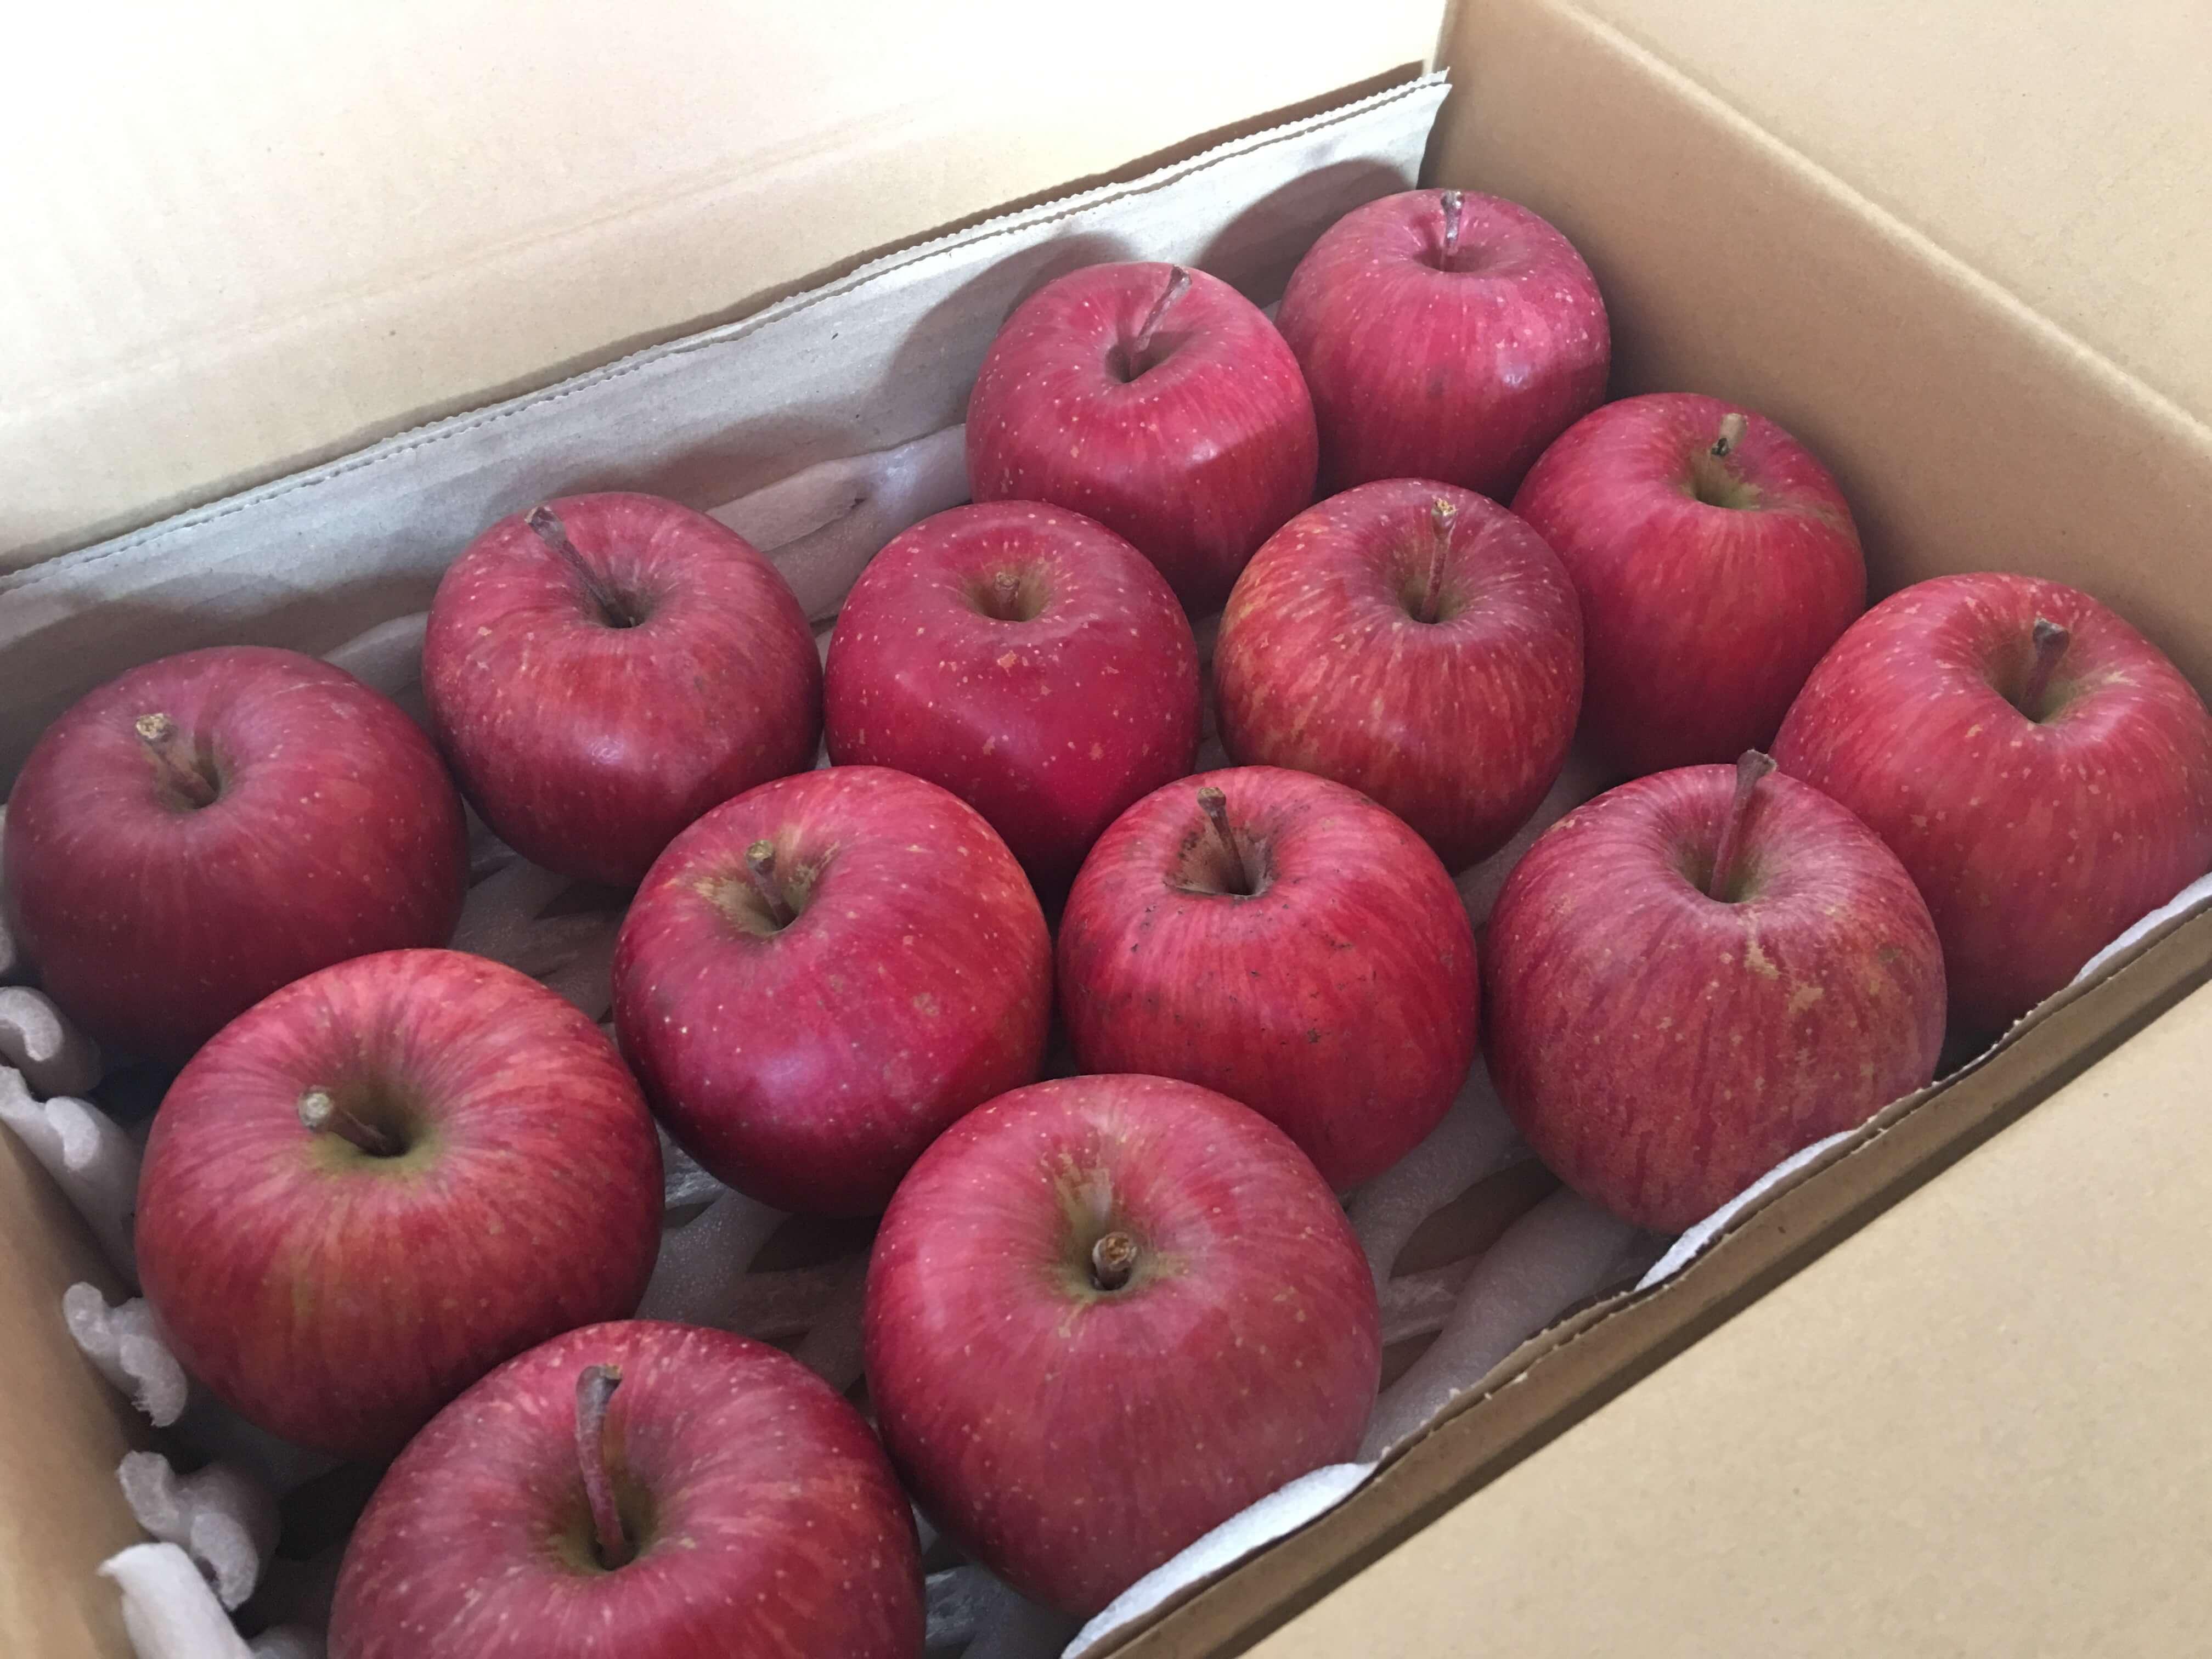 633e39000bf9dc783af6f9779fb2fa57_小玉りんごの販売を開始しました。